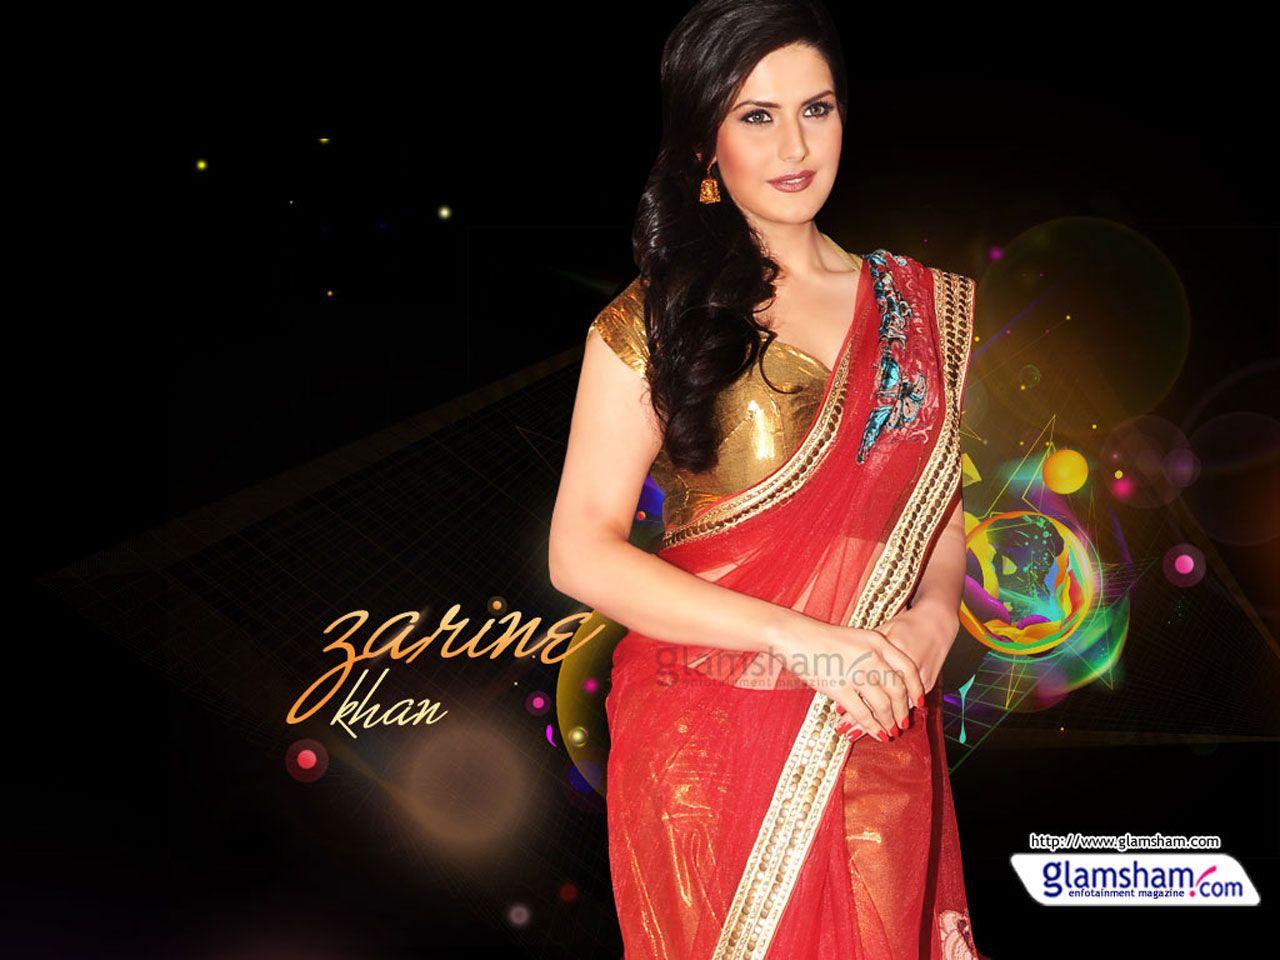 wallpapers of indian actress in saree | imagewallpapers.co